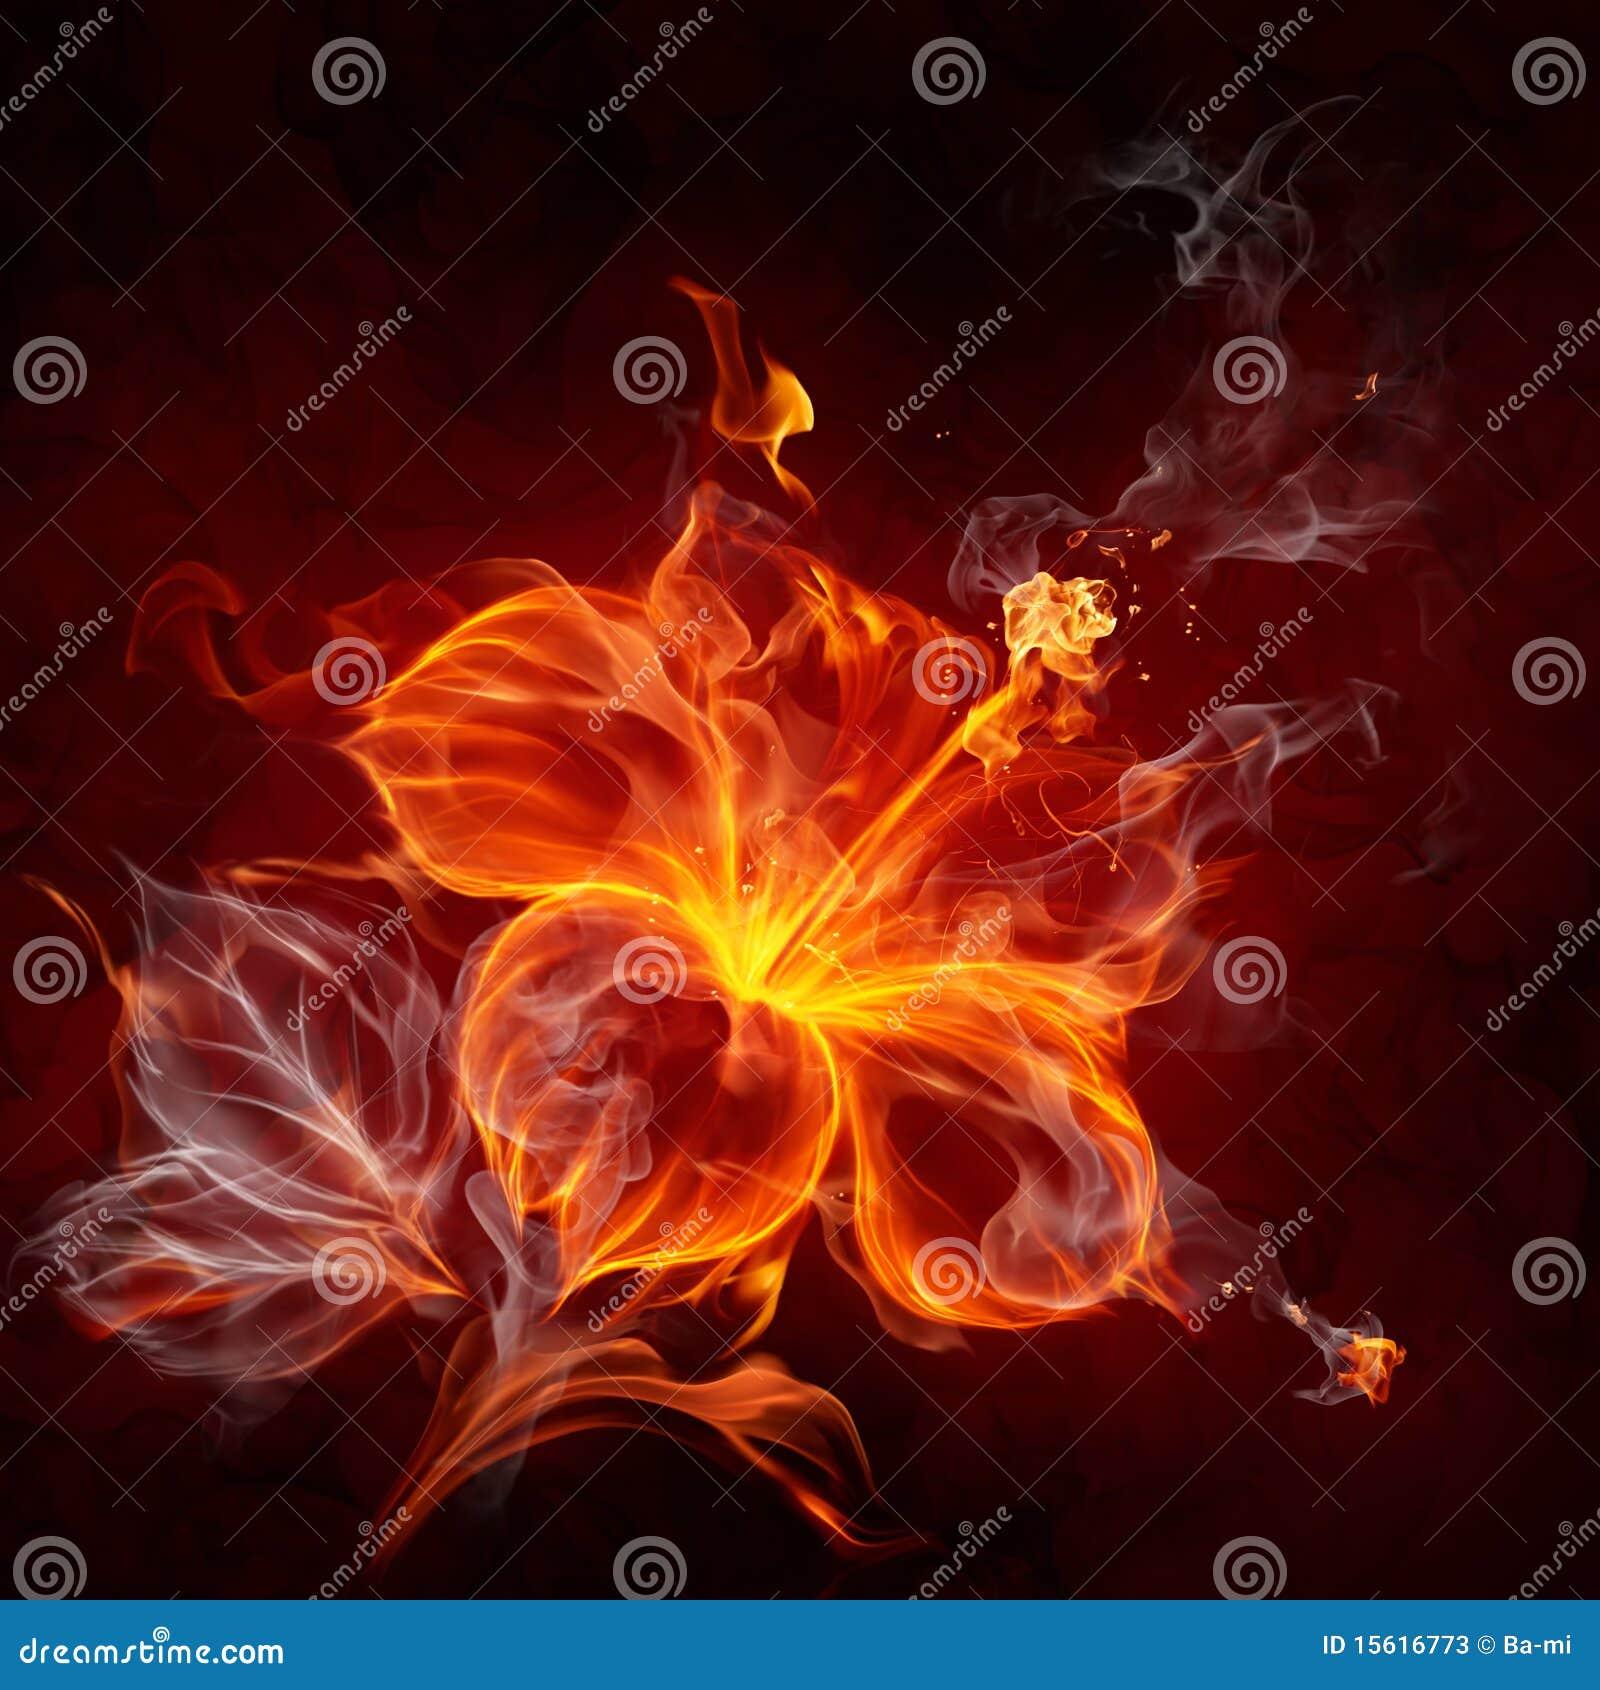 fire flower stock illustration illustration of burning